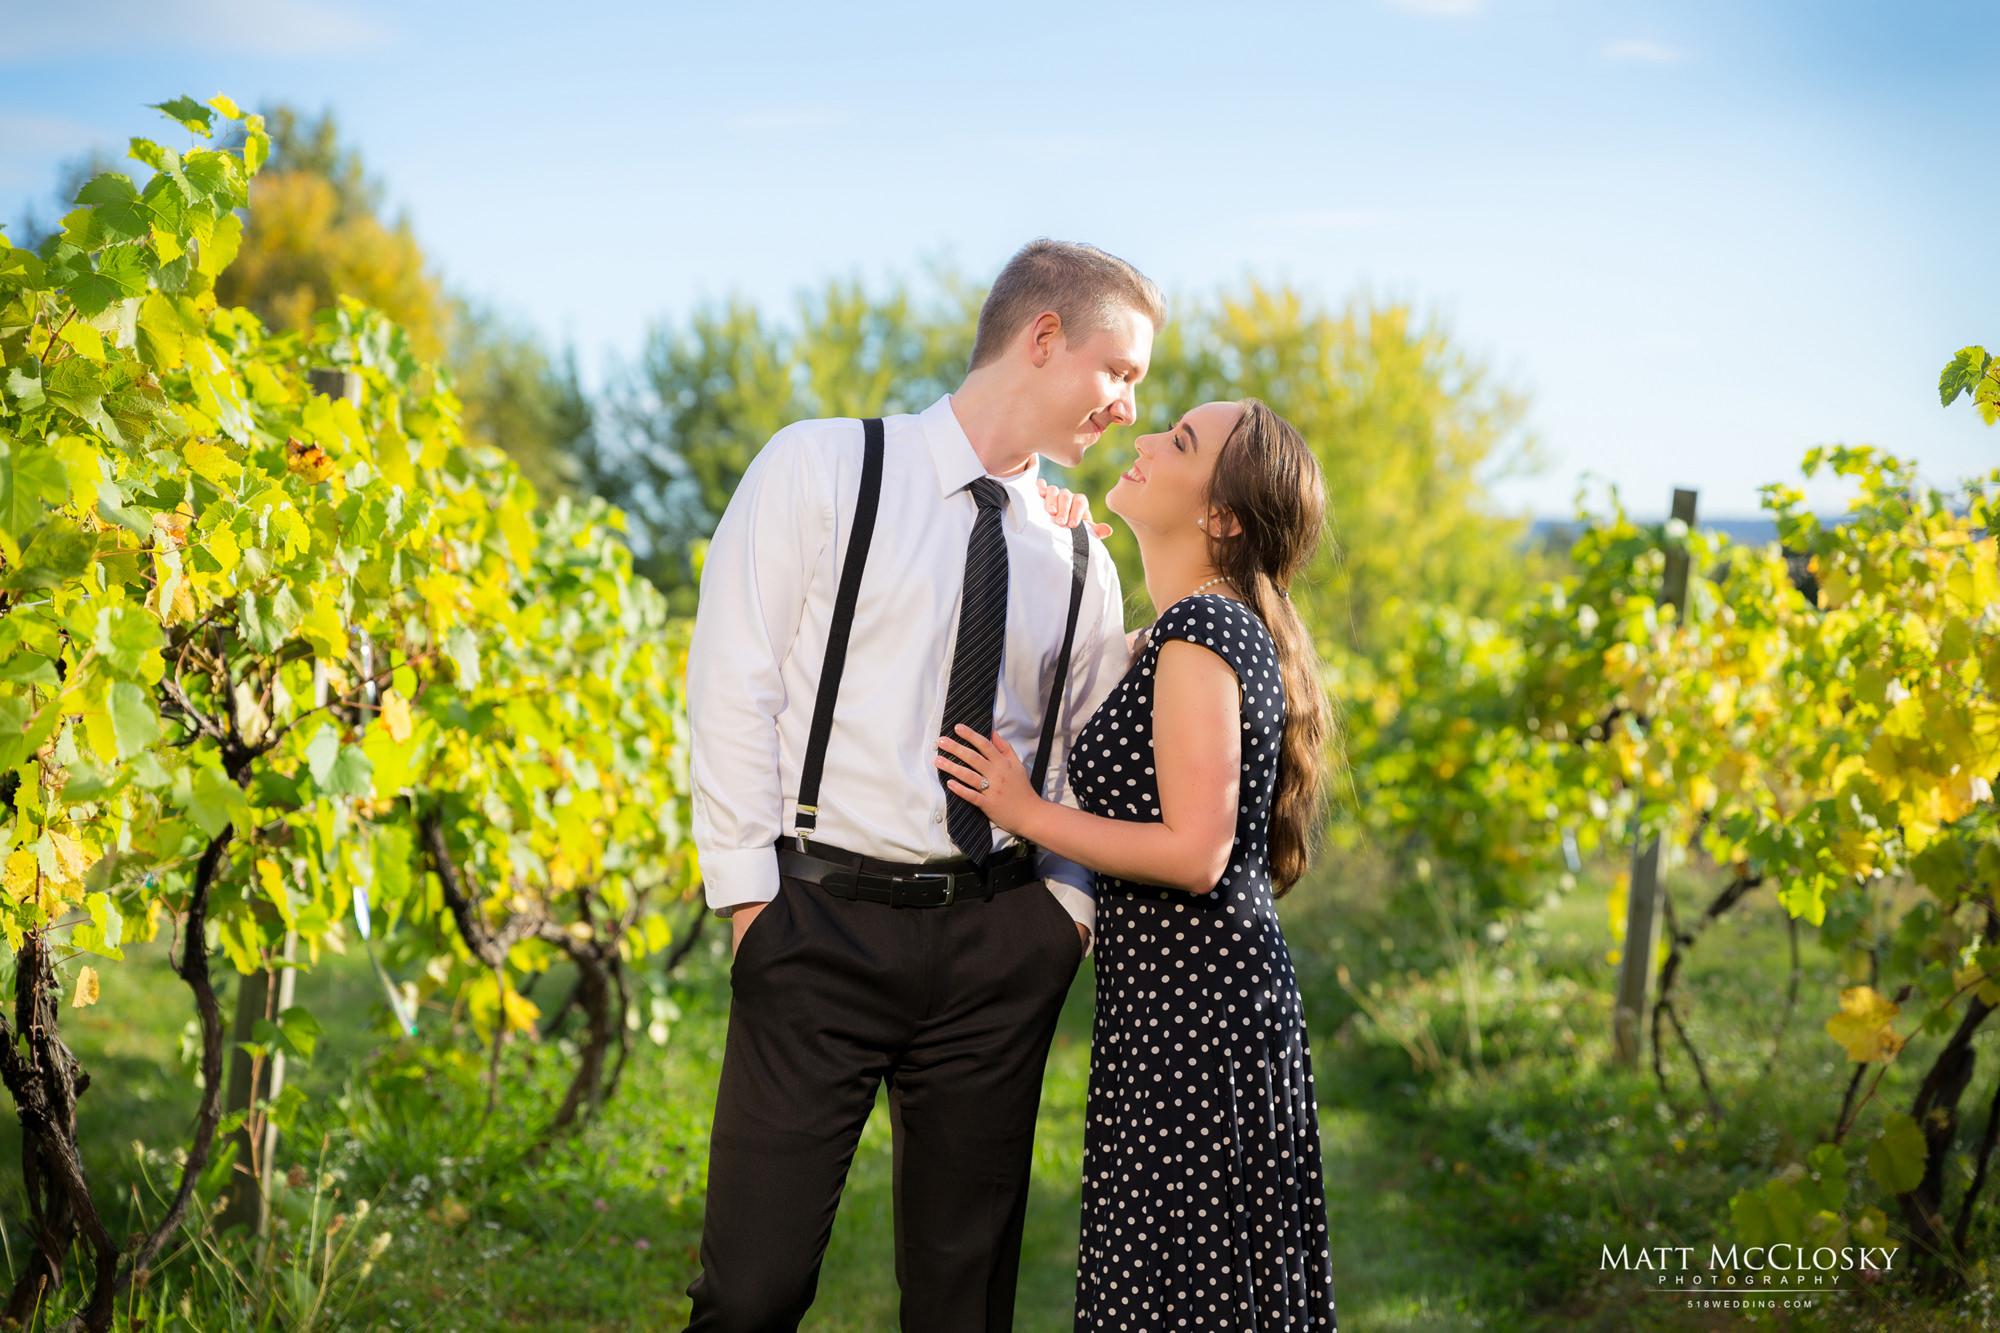 Emma Cranston Rob Altamont Vineyard Winery Engagement 518Wedding 518 Wedding 518Photo 518 Photo Wedding Photographer Albany NY Altamont Manor Vineyard engagement photos